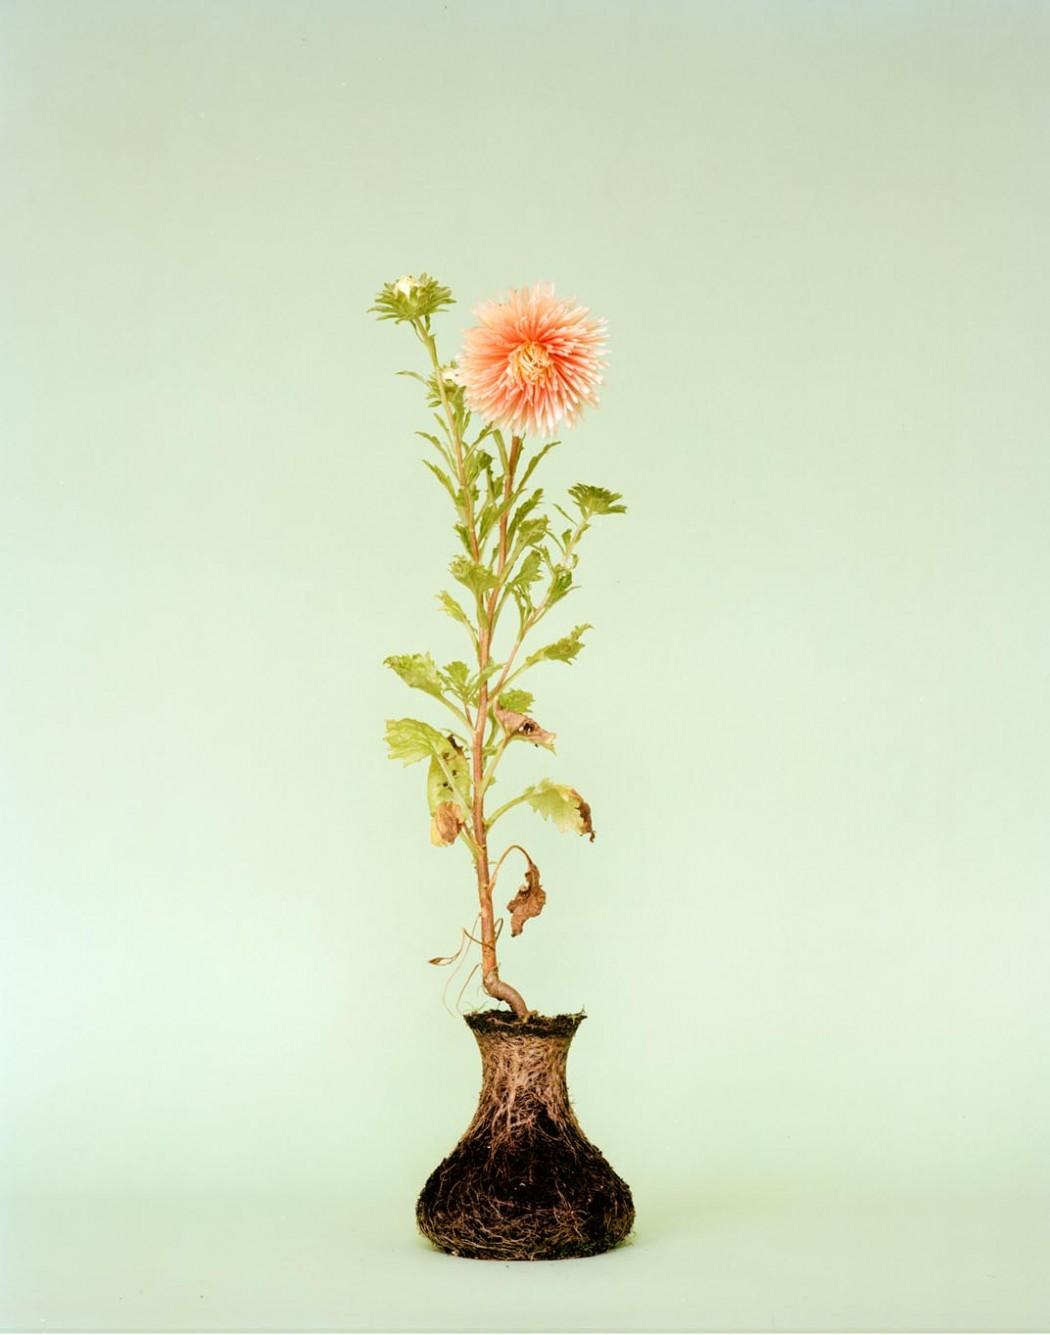 Flower Arrangements that Don't Need Vases